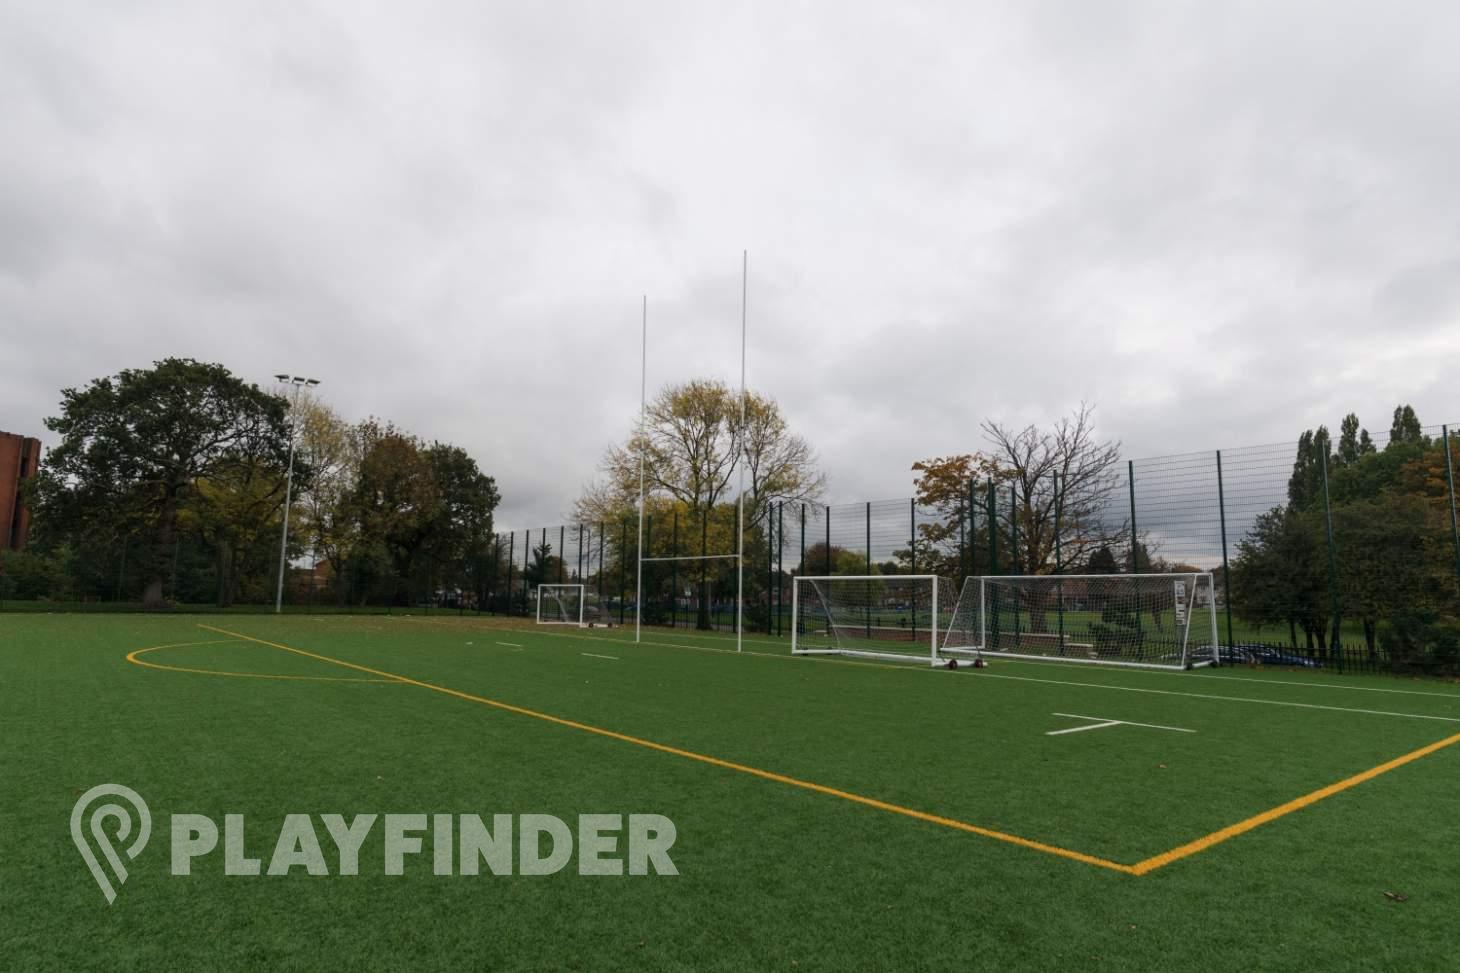 Manchester Enterprise Academy Wythenshawe 11 a side | Astroturf football pitch